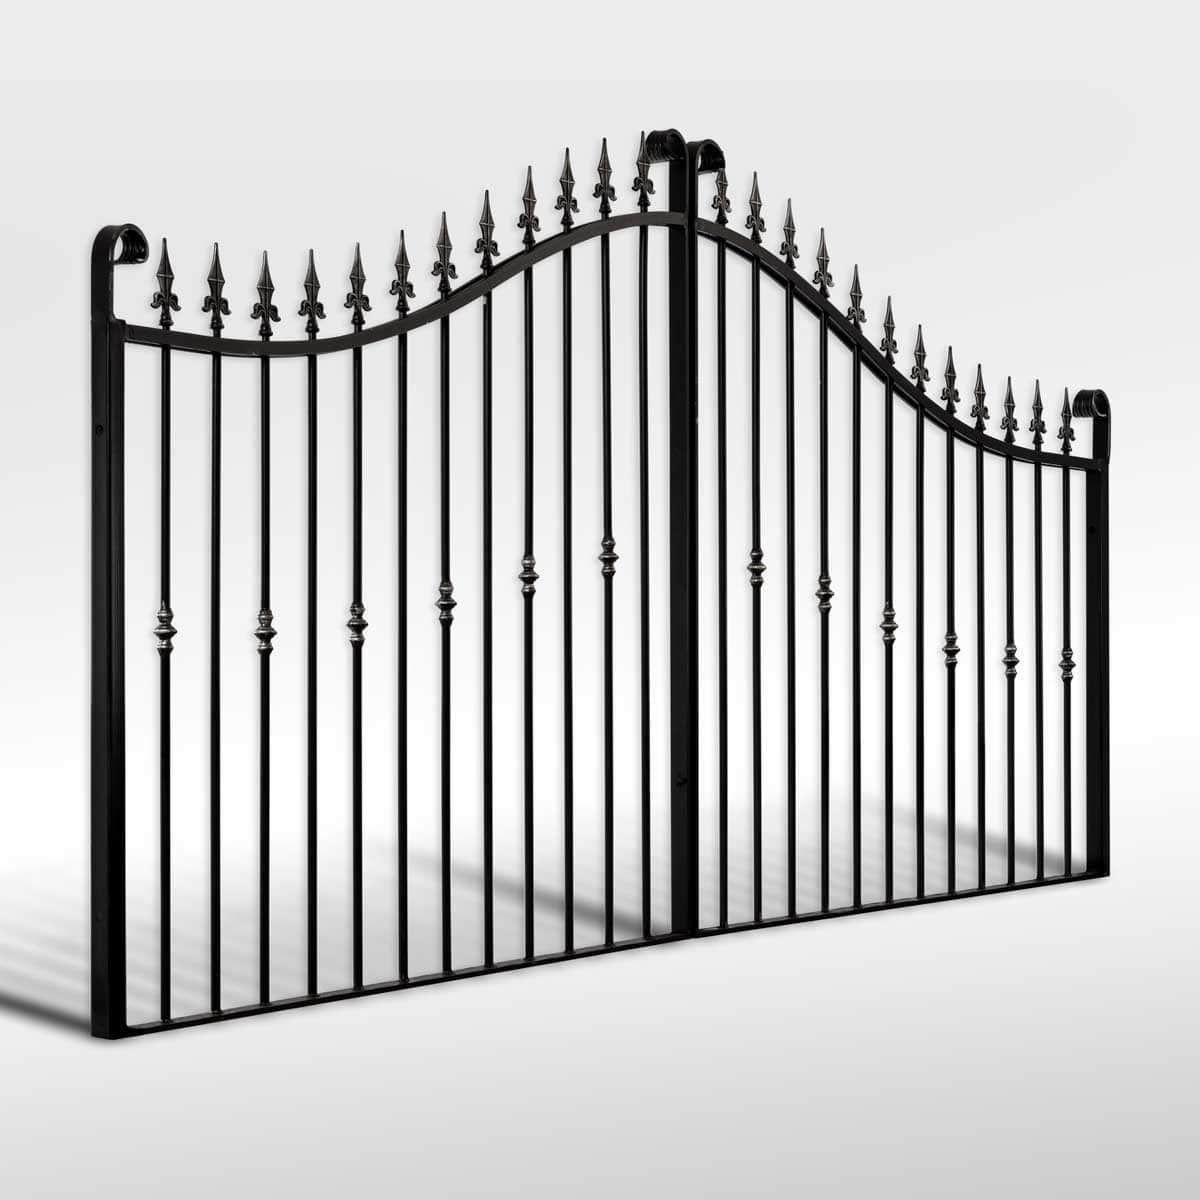 The Winterfold Wrought Iron Driveway Gate Wrought Iron